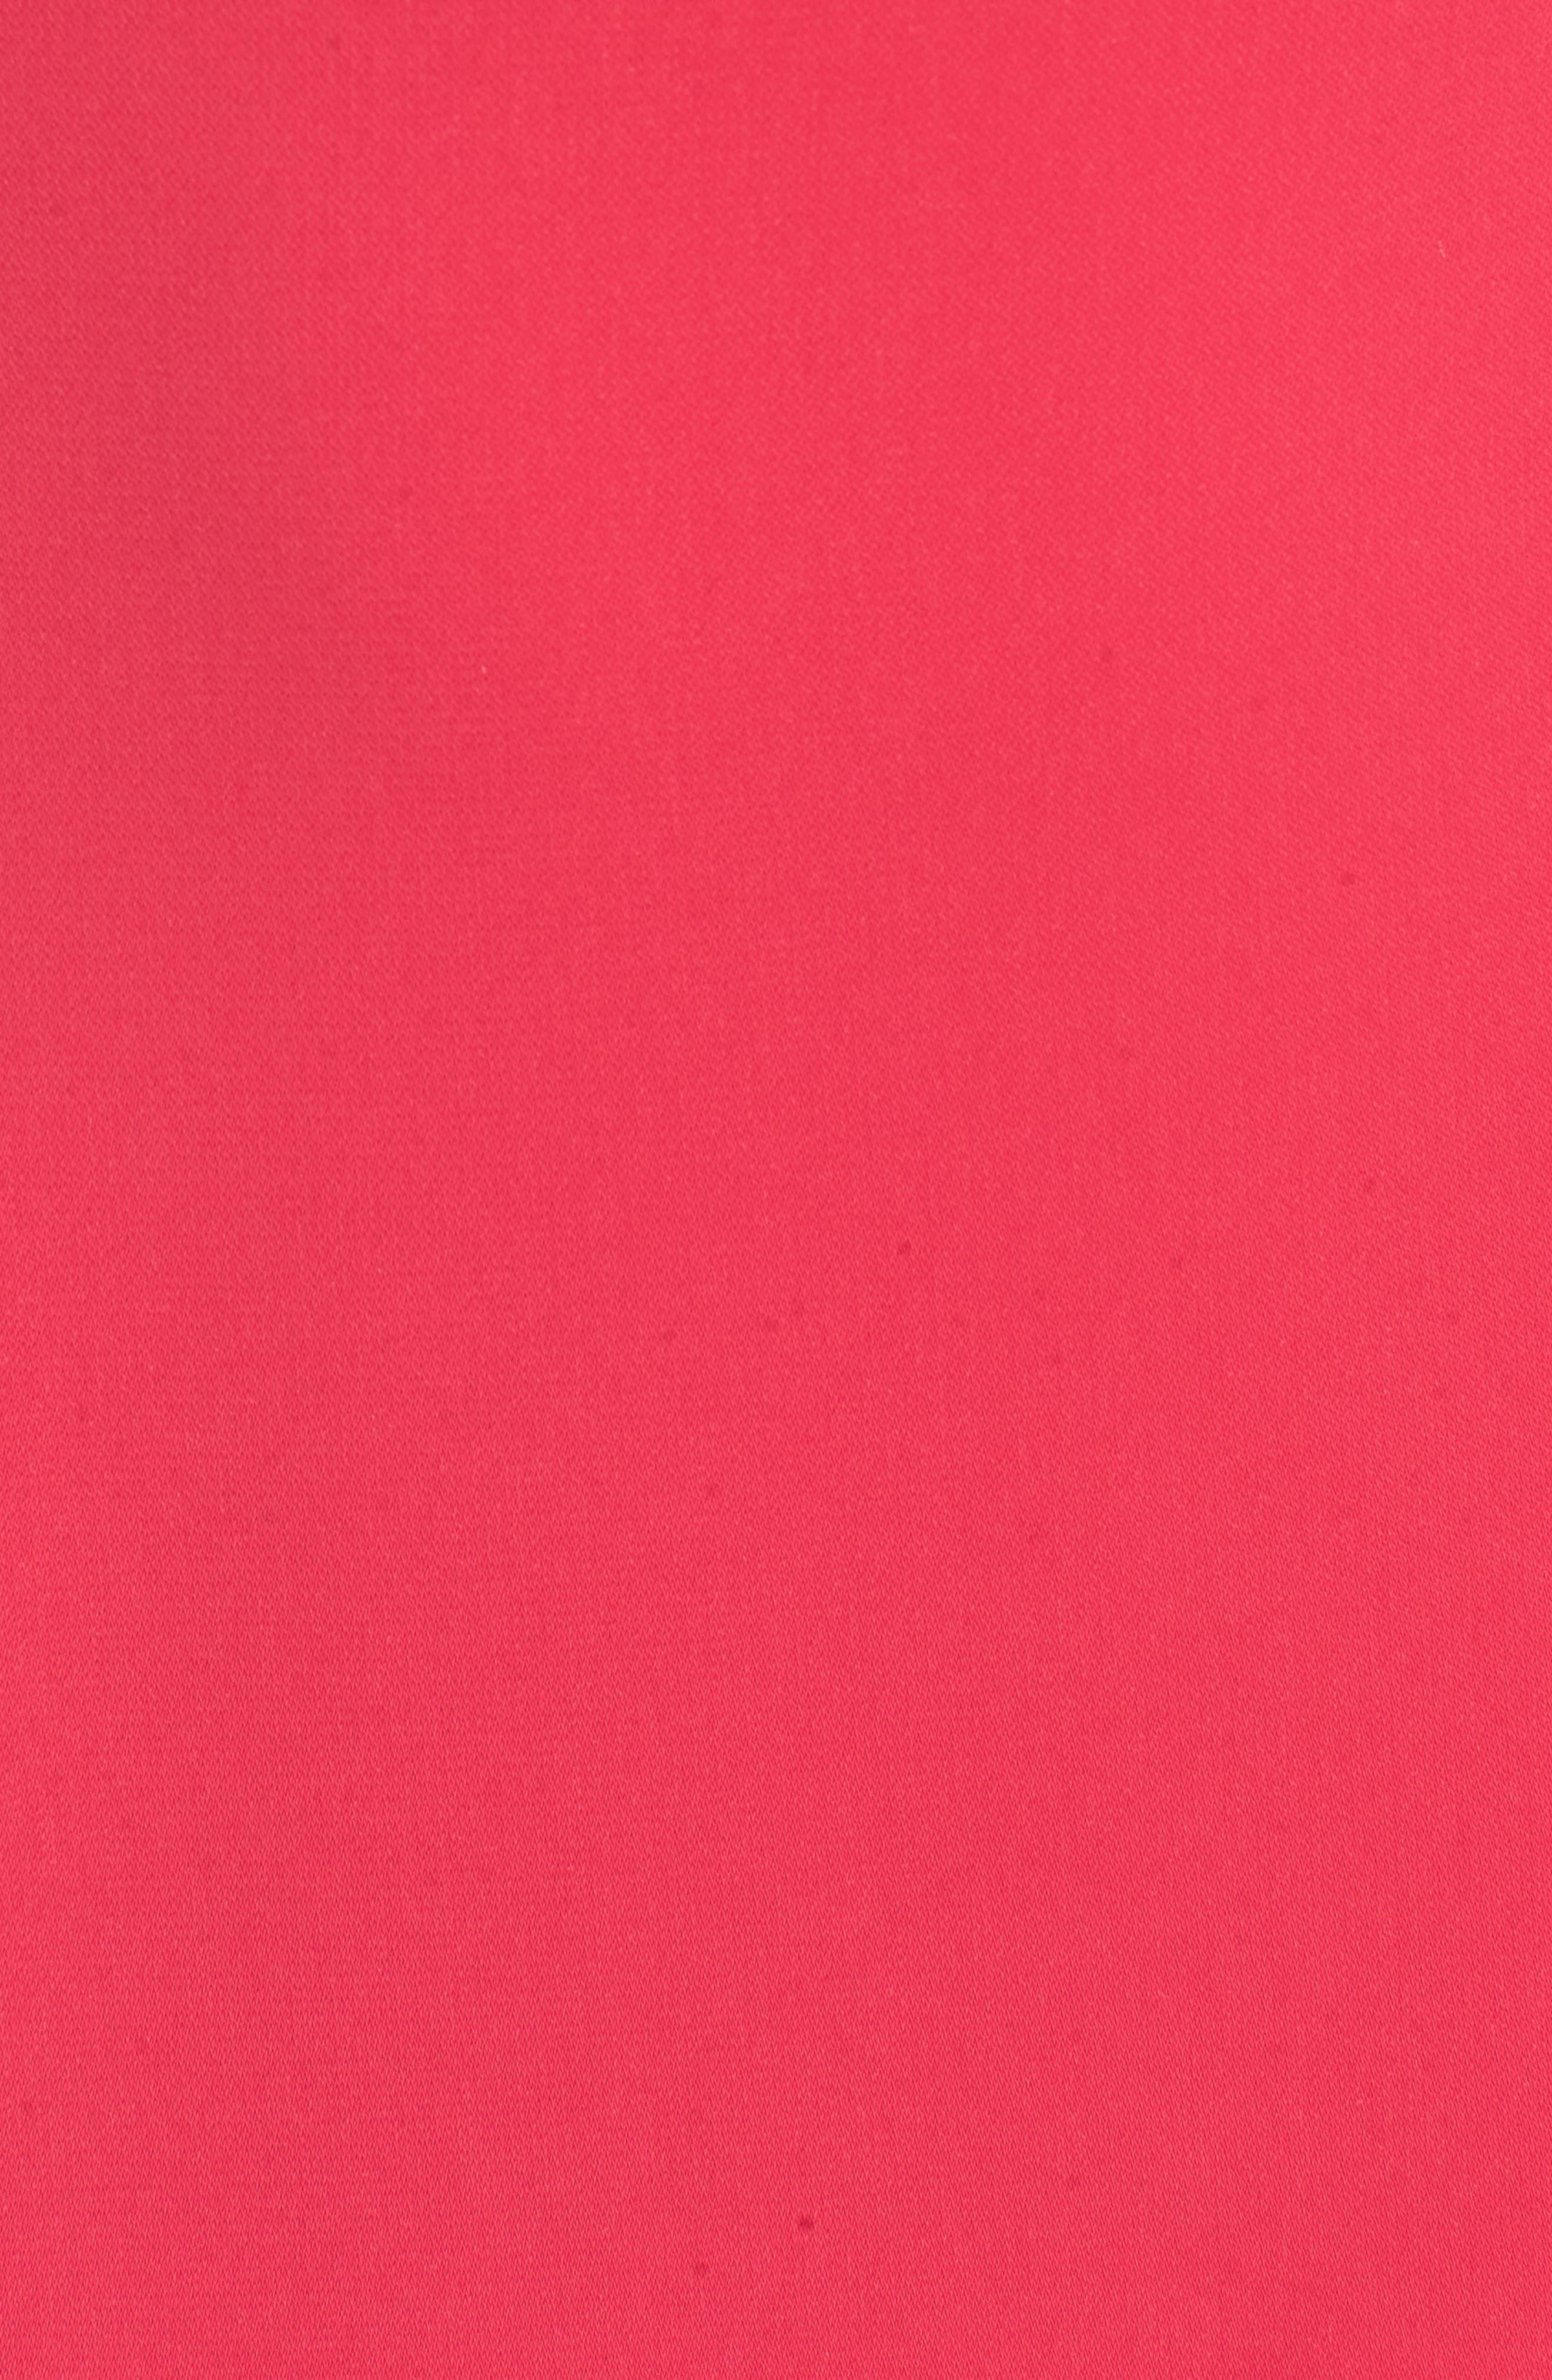 Asymmetric Ruffle Hem Dress,                             Alternate thumbnail 6, color,                             PINK BRIGHT